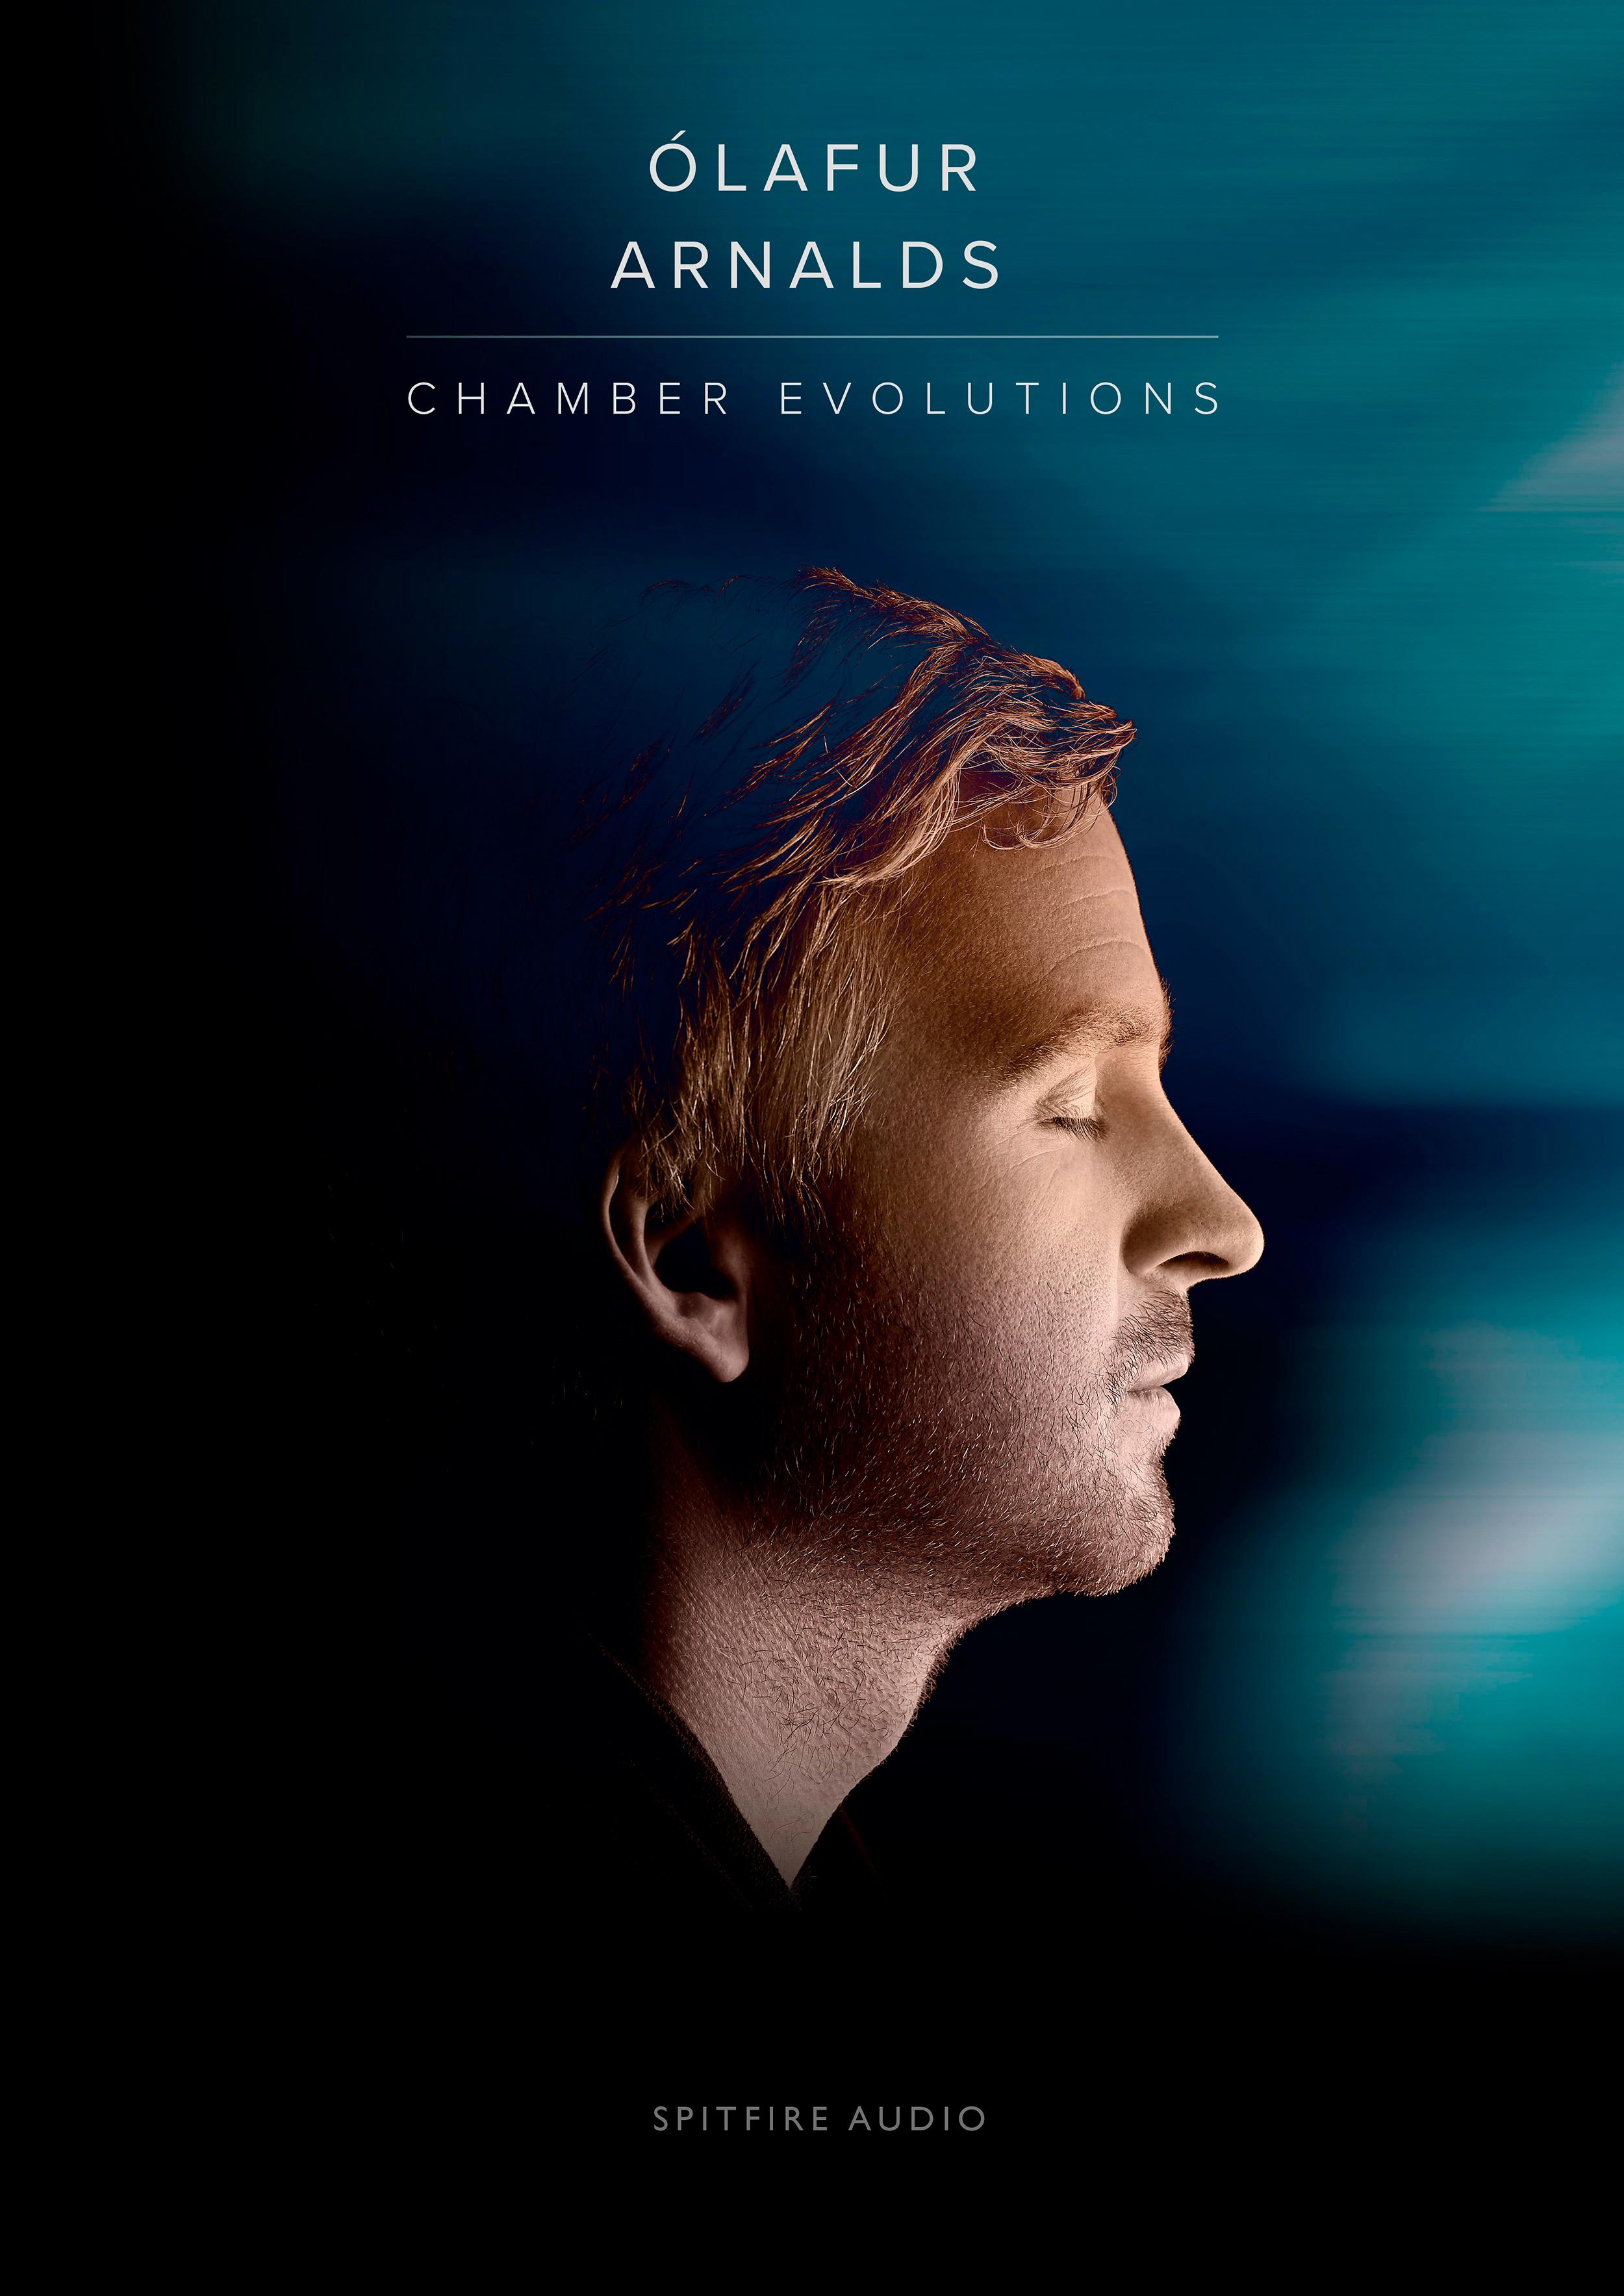 Ólafur Arnalds Chamber Evolutions Artwork Spitfire Audio